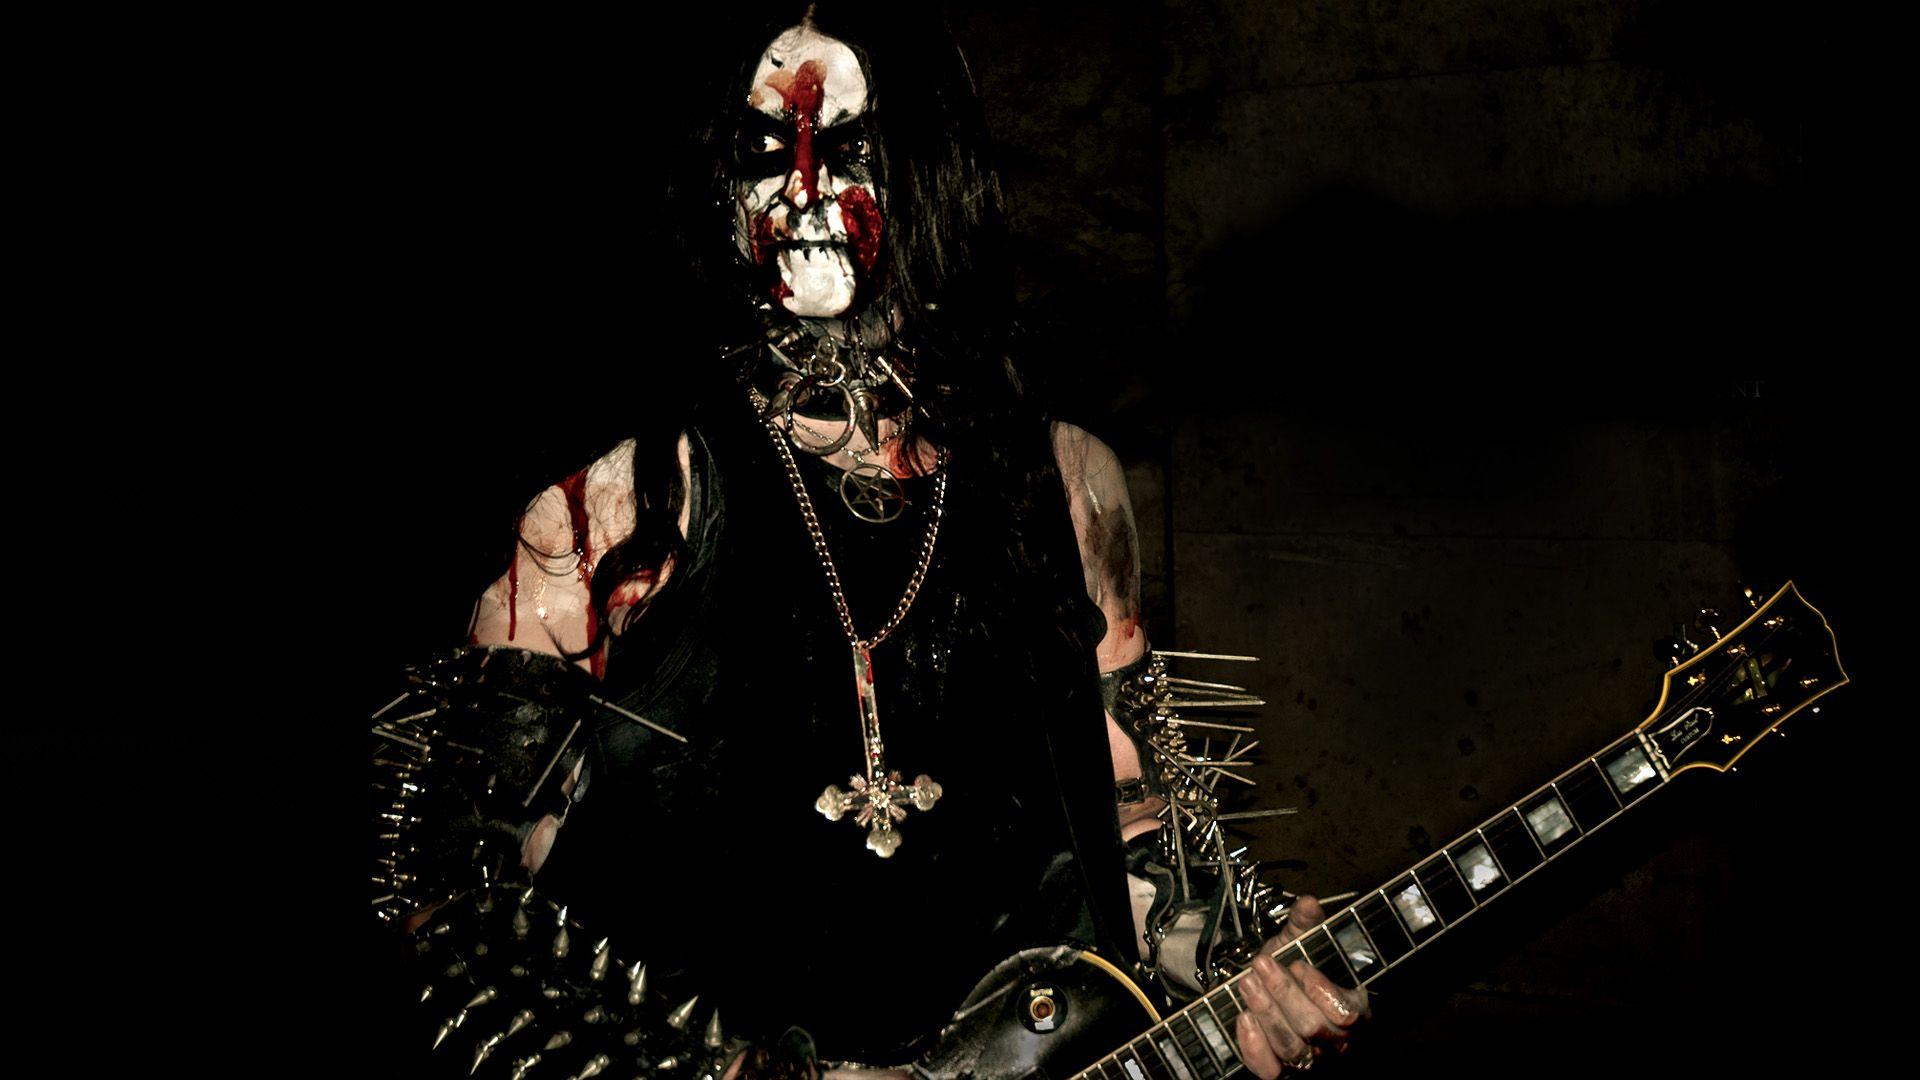 Black Metal Pictures Gorgoroth Black Metal Heavy Hard Rock Band Bands Groups Group Concert Black Metal Metal Bands Metal